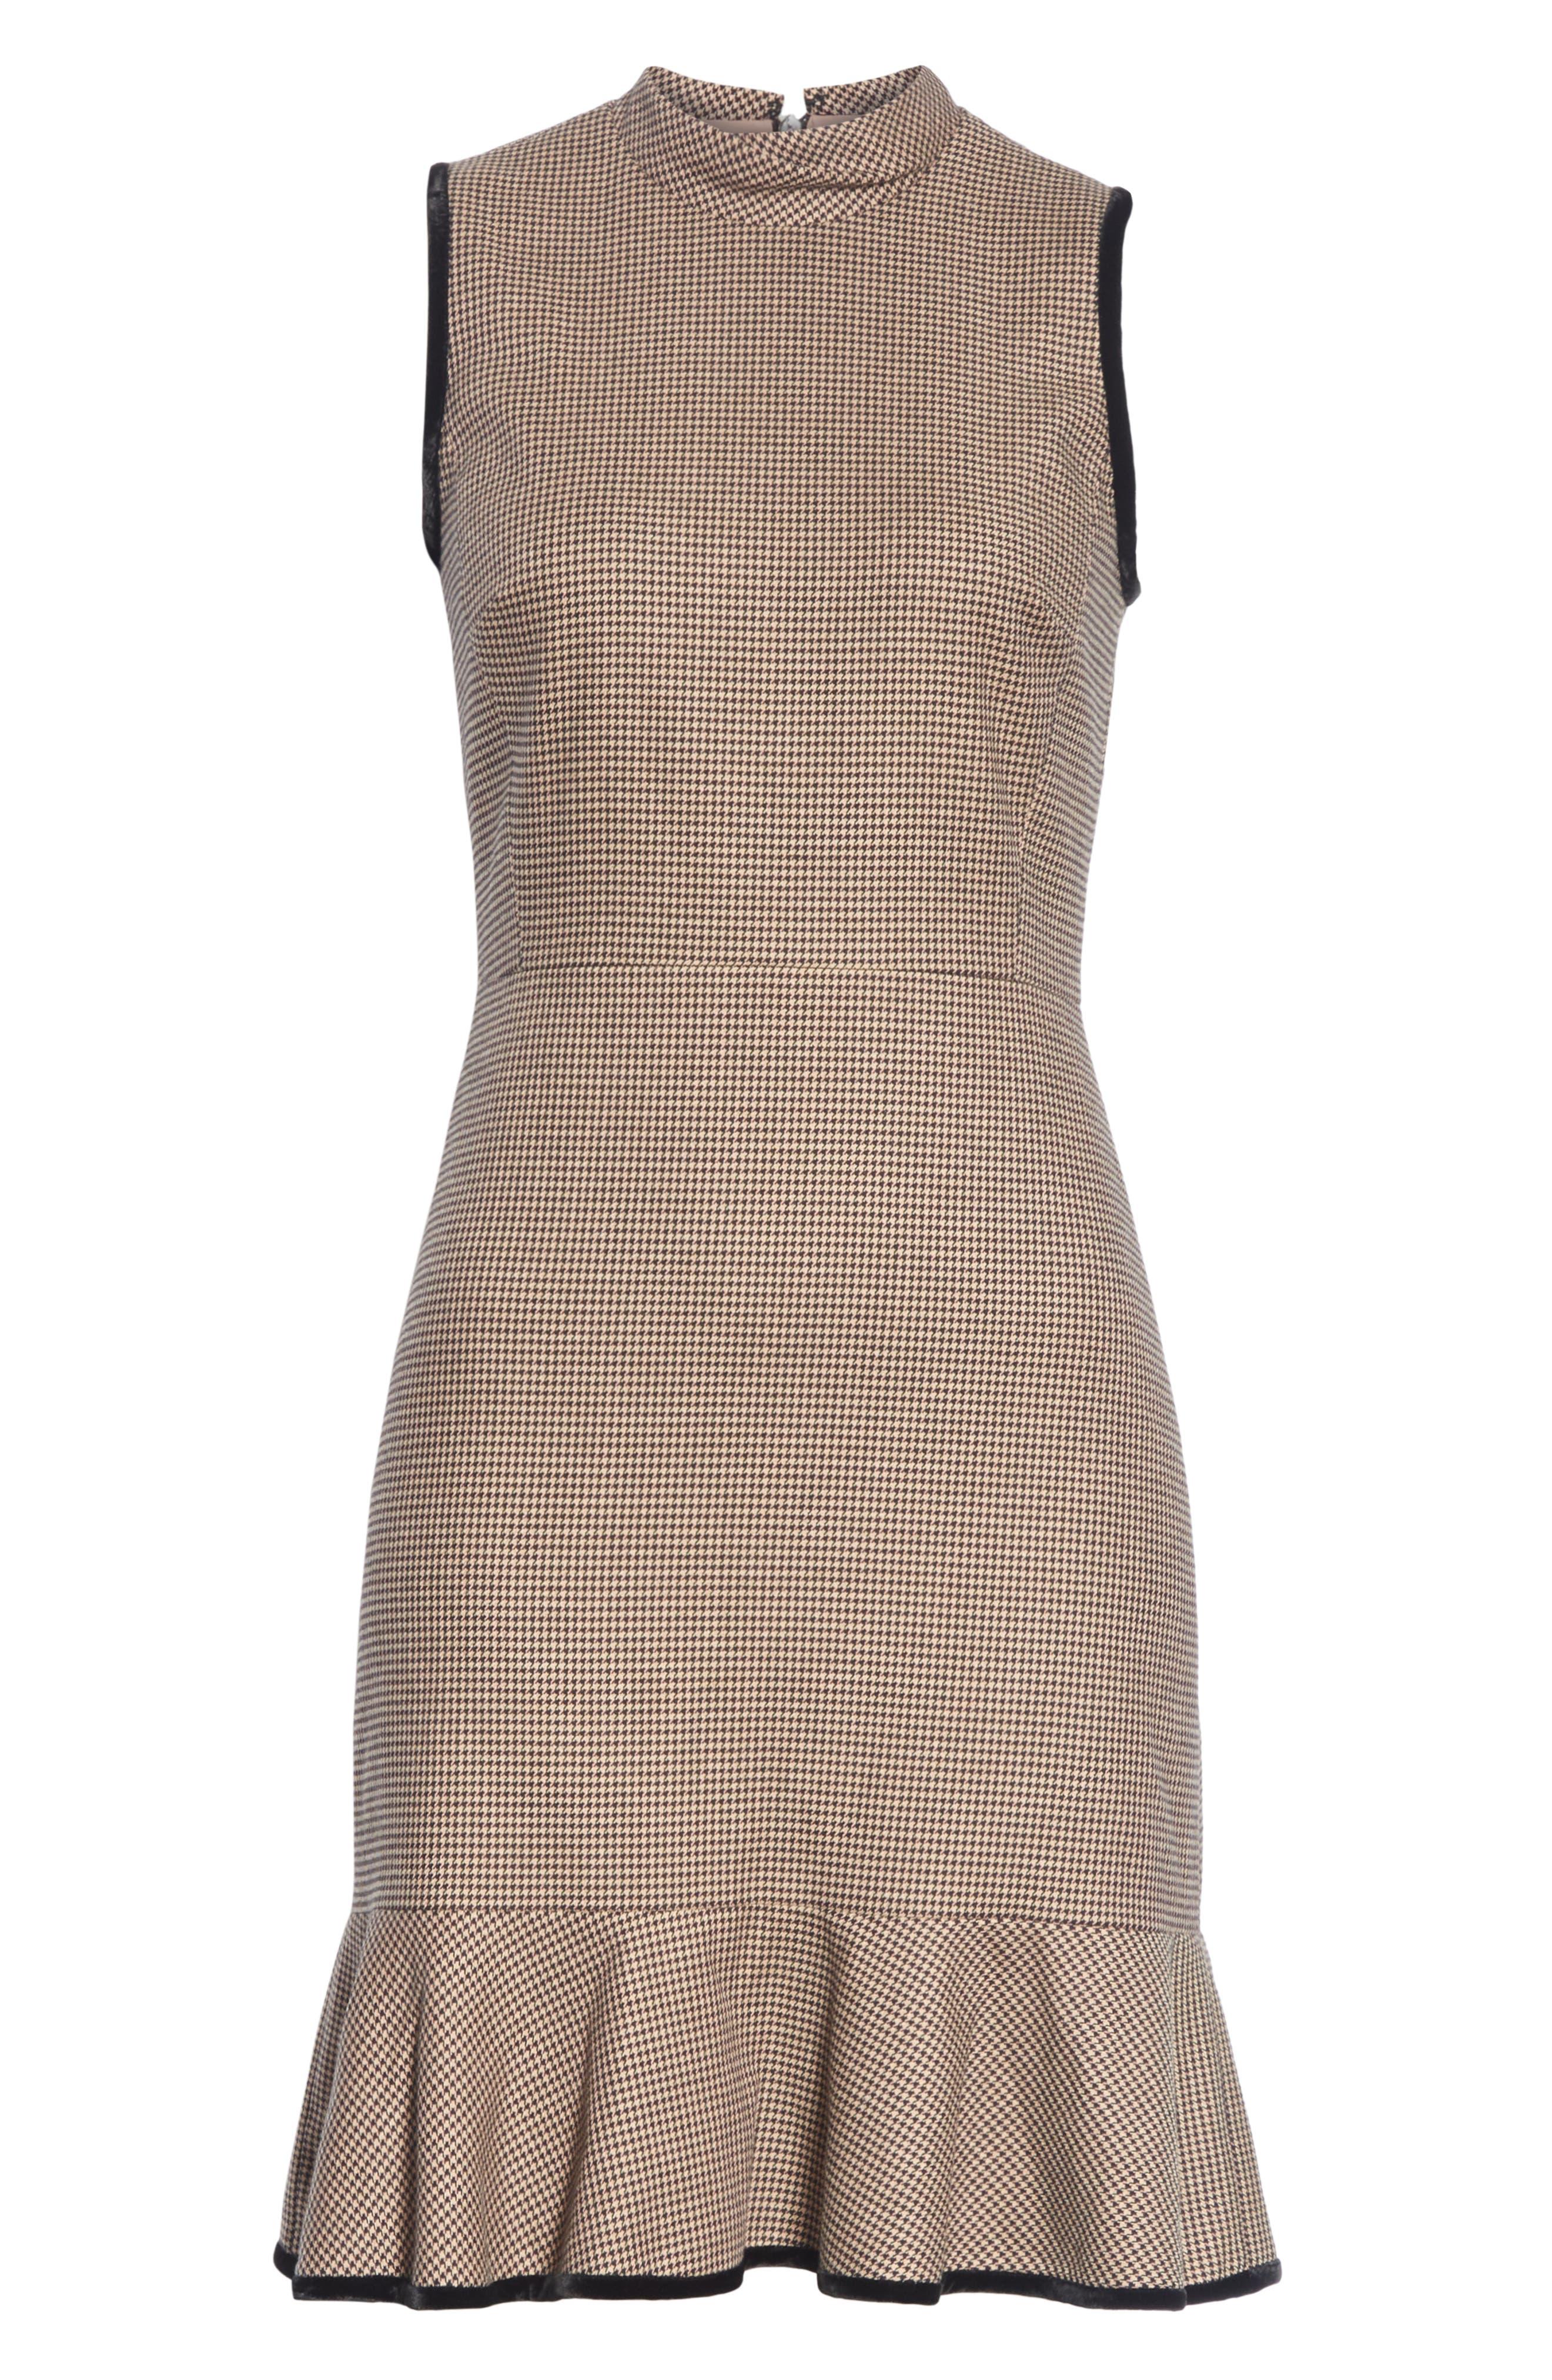 Houndstooth Sheath Dress,                             Alternate thumbnail 6, color,                             CAMEL/ BLACK